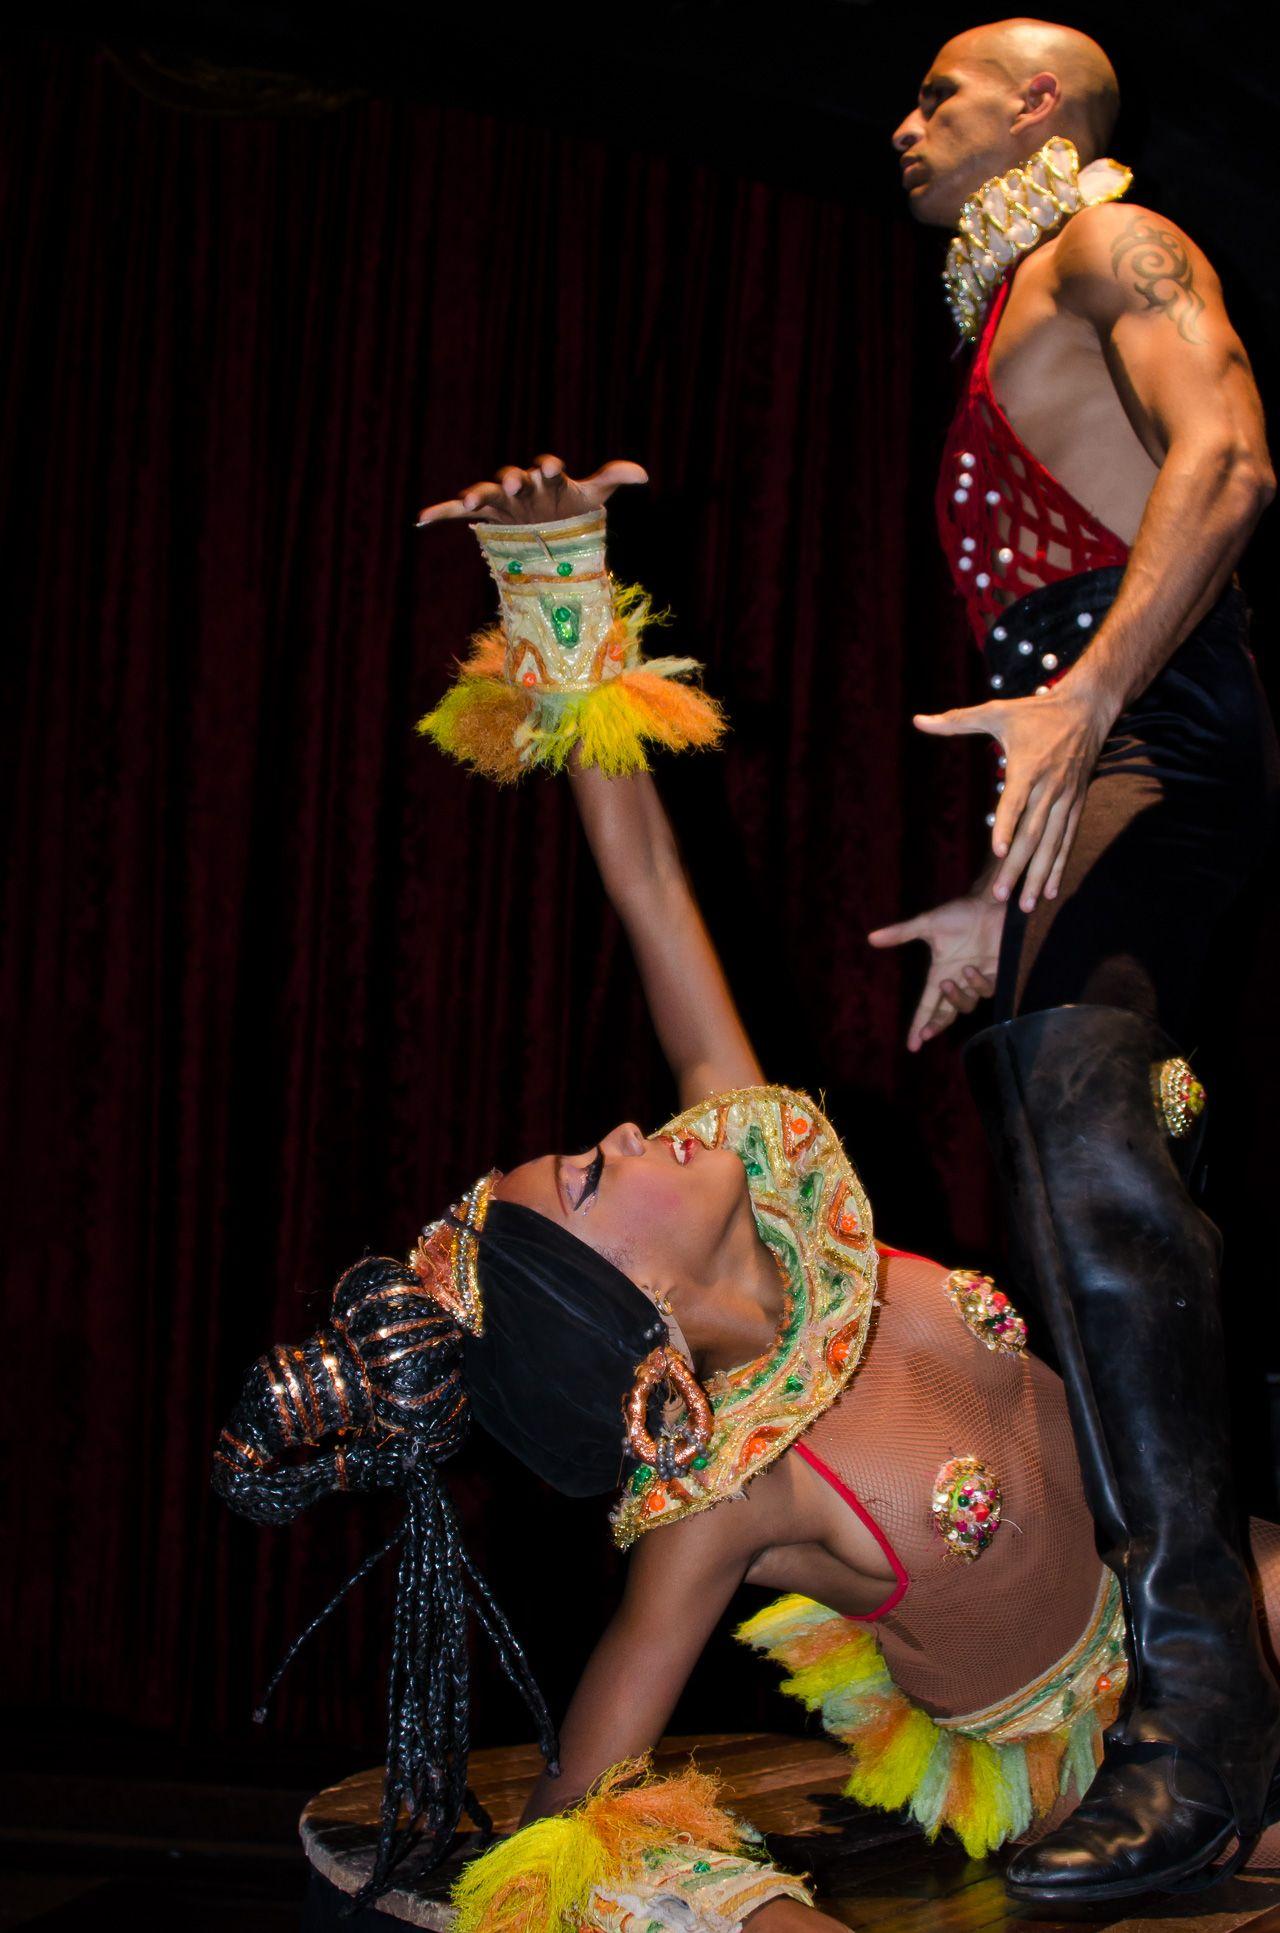 Cabaret performers. Havana, Cuba